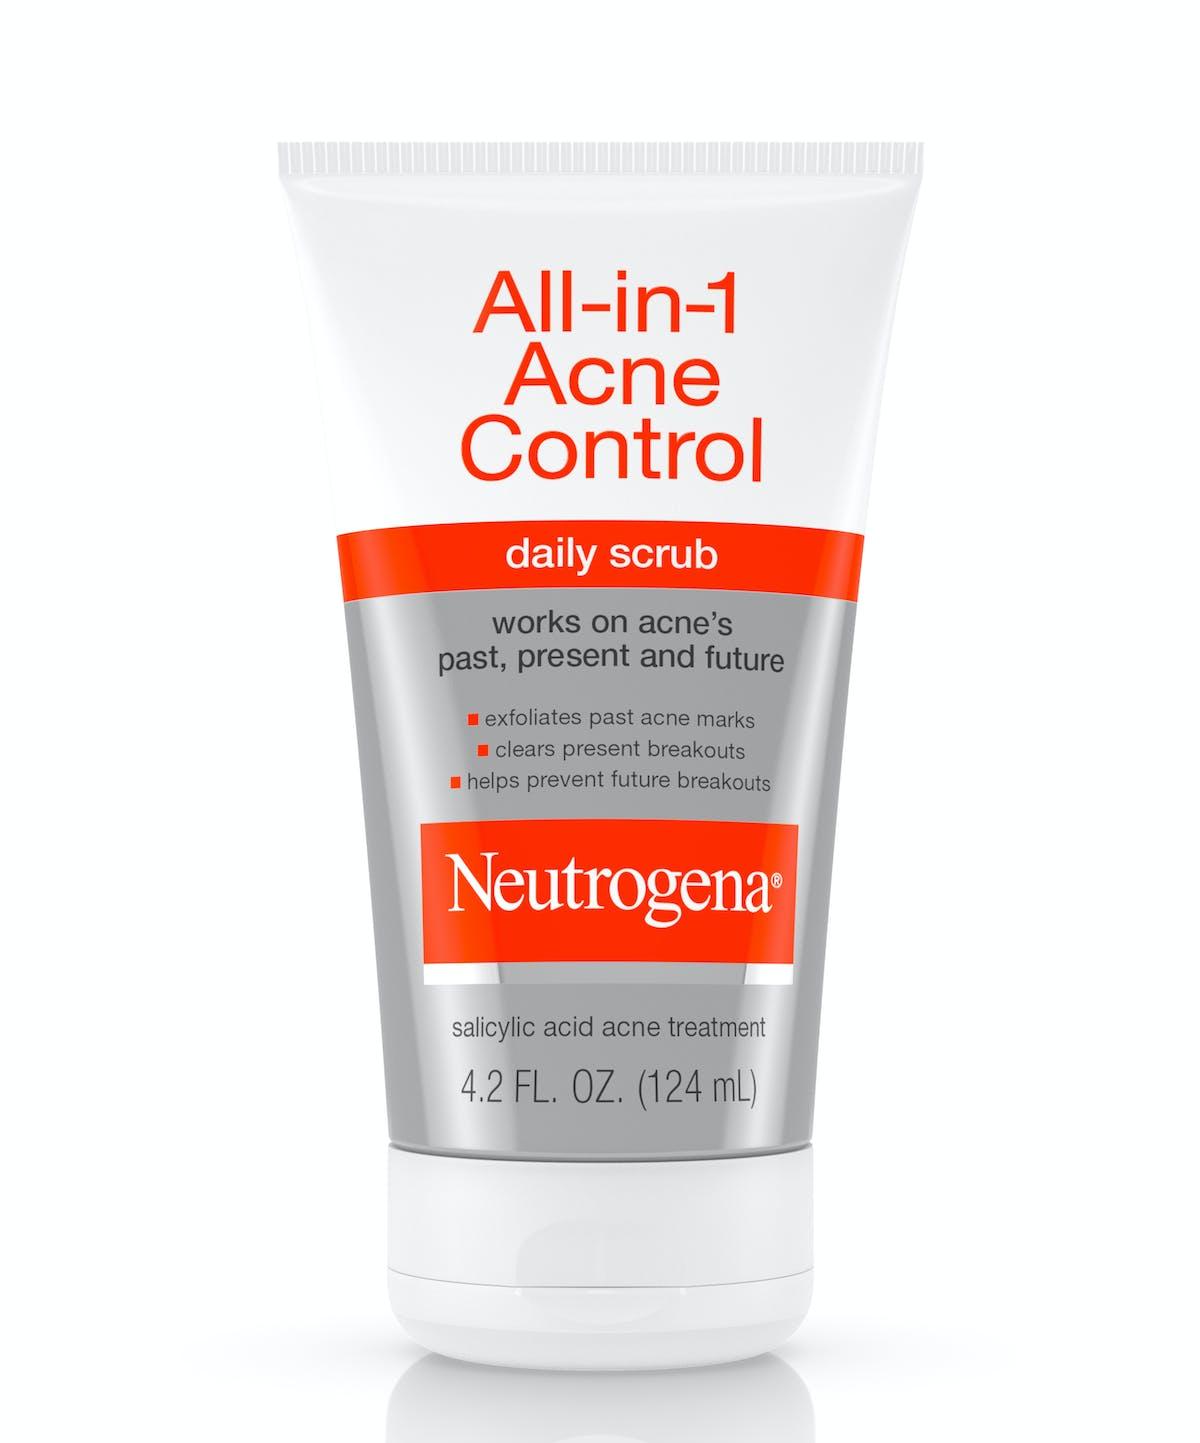 All-in-1 Acne Control Daily Scrub